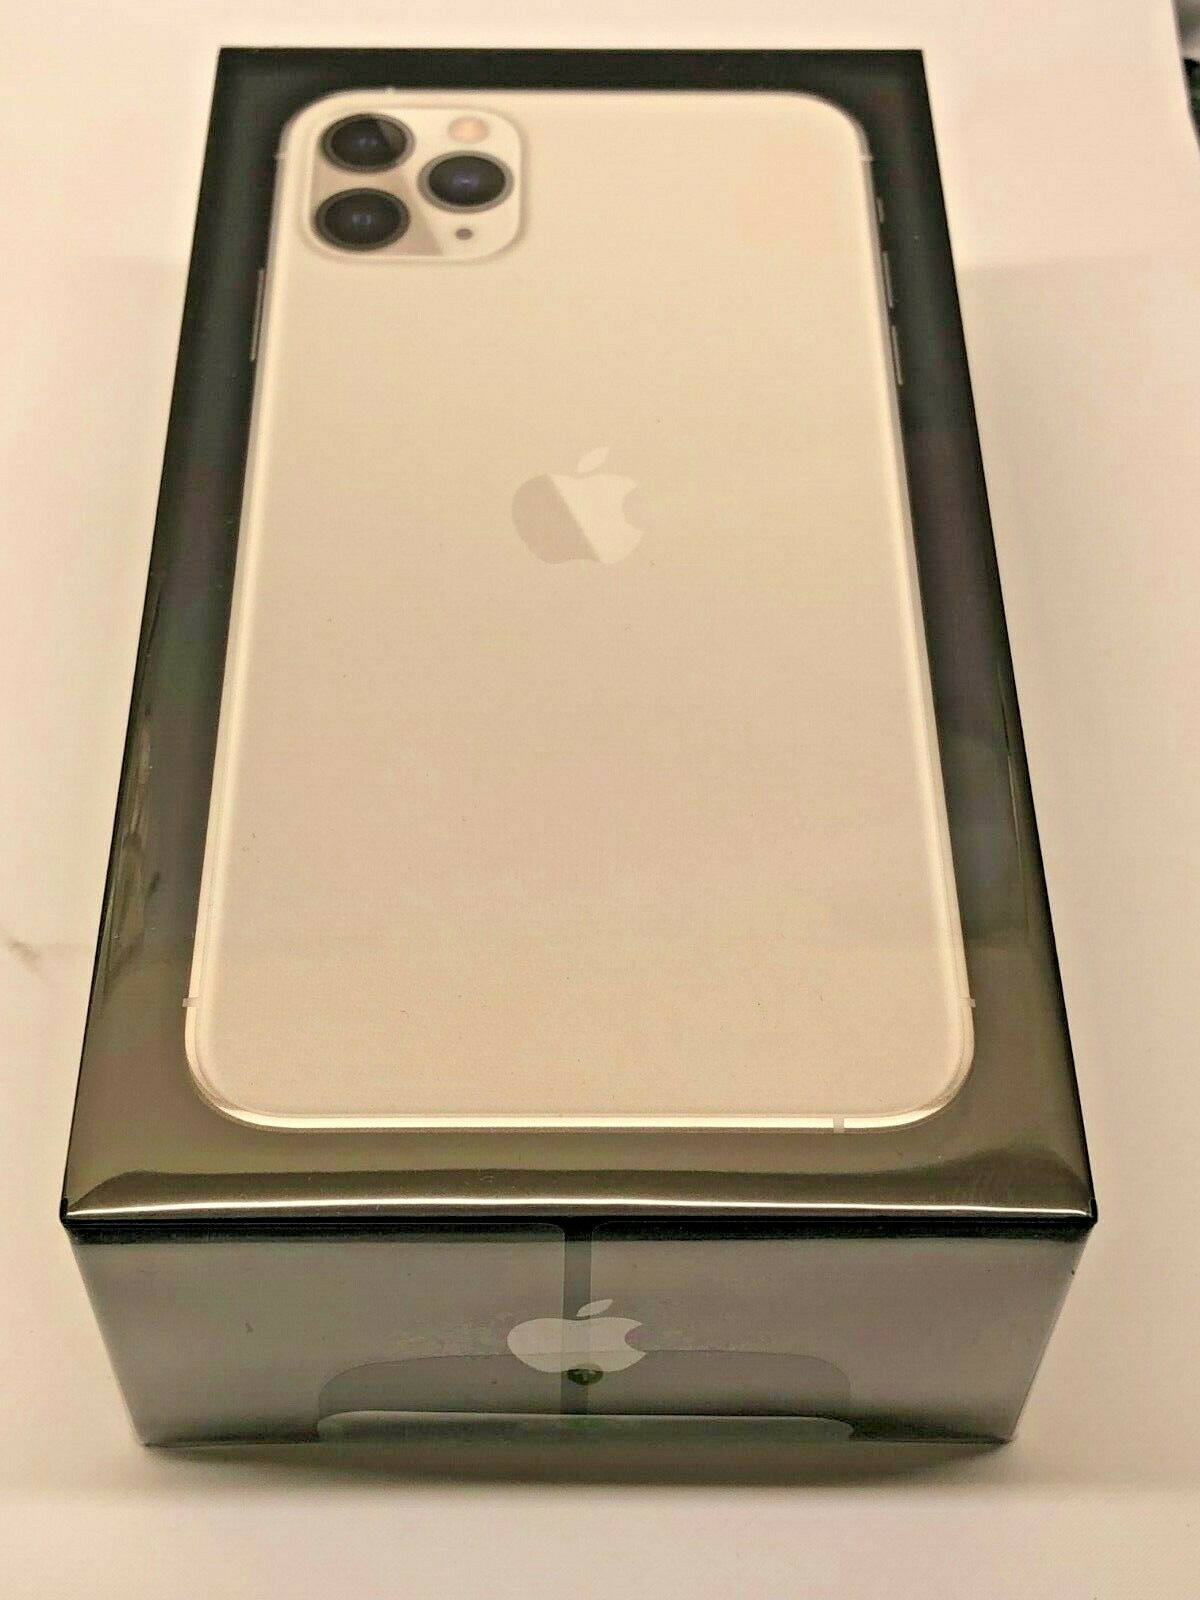 Apple iPhone 11 Pro 64GB € 580 iPhone 11 Pro 64GB € 610 iPhone 11 64GB € 450 iPhone XS 64GB € 400 iPhone XS Μέγιστο 64gb € 430 iPhone X 64gb € 300 iPhone XR 64gb € 340 Whatsapp Chat +27661104268